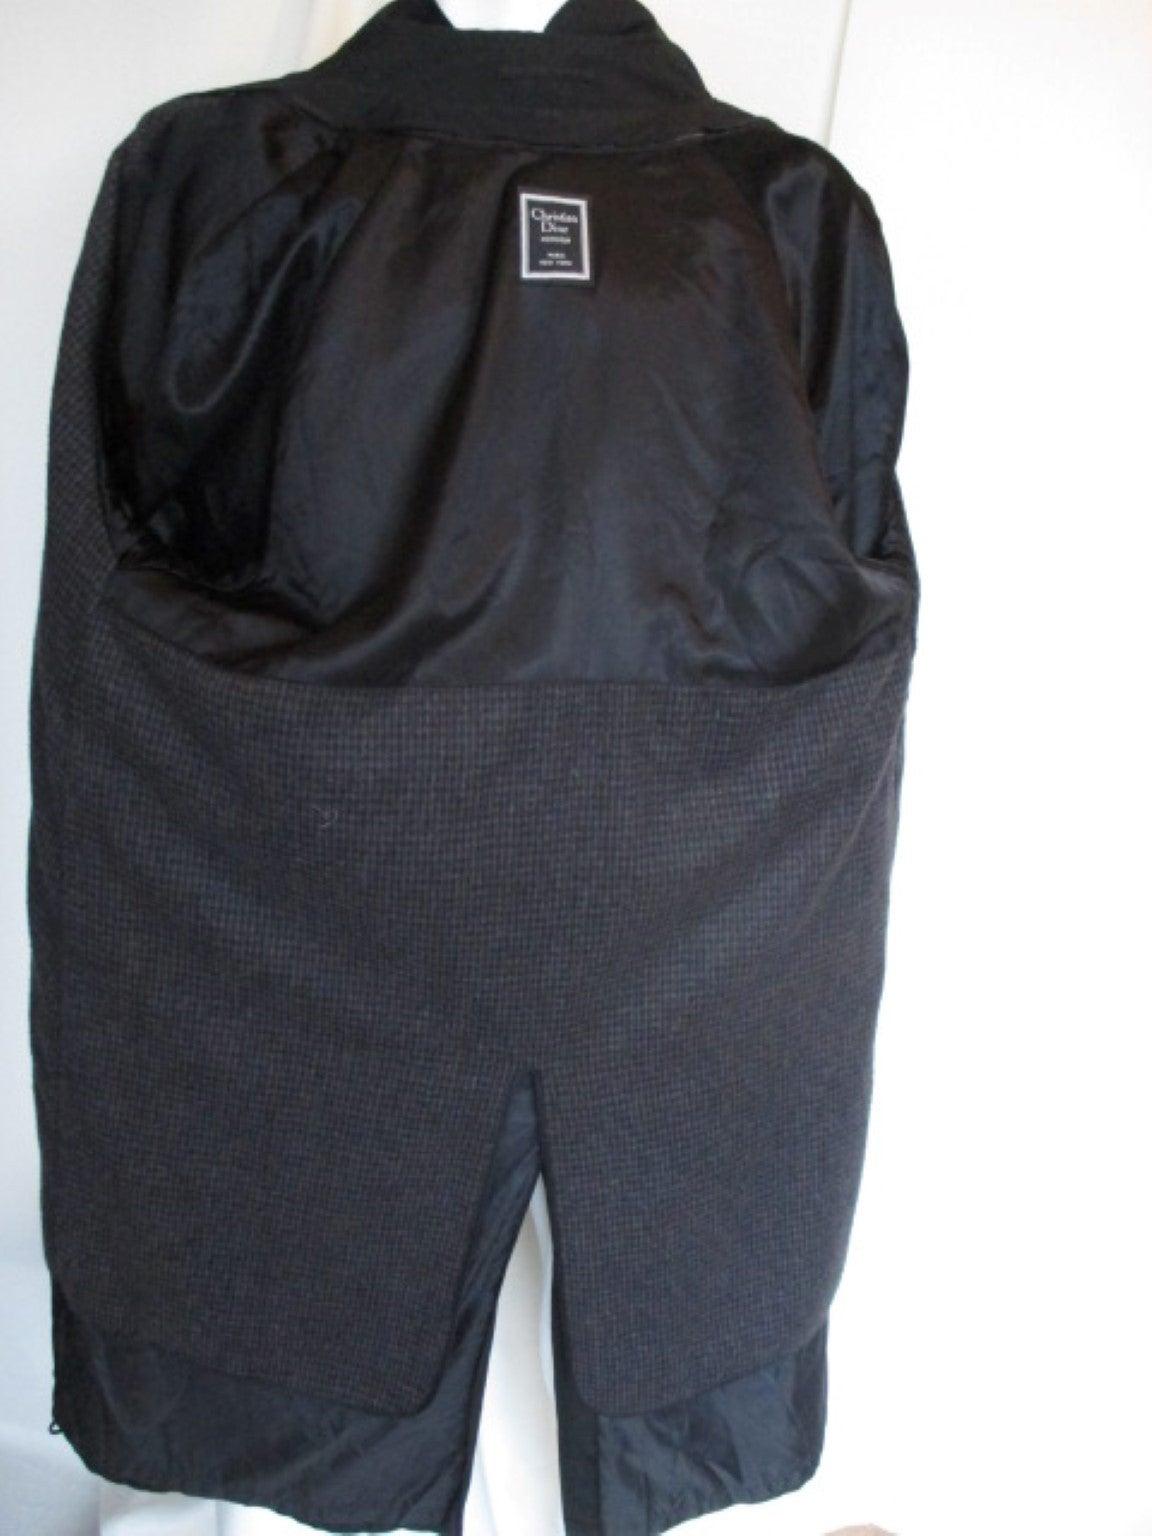 Christian Dior black men's topcoat 4